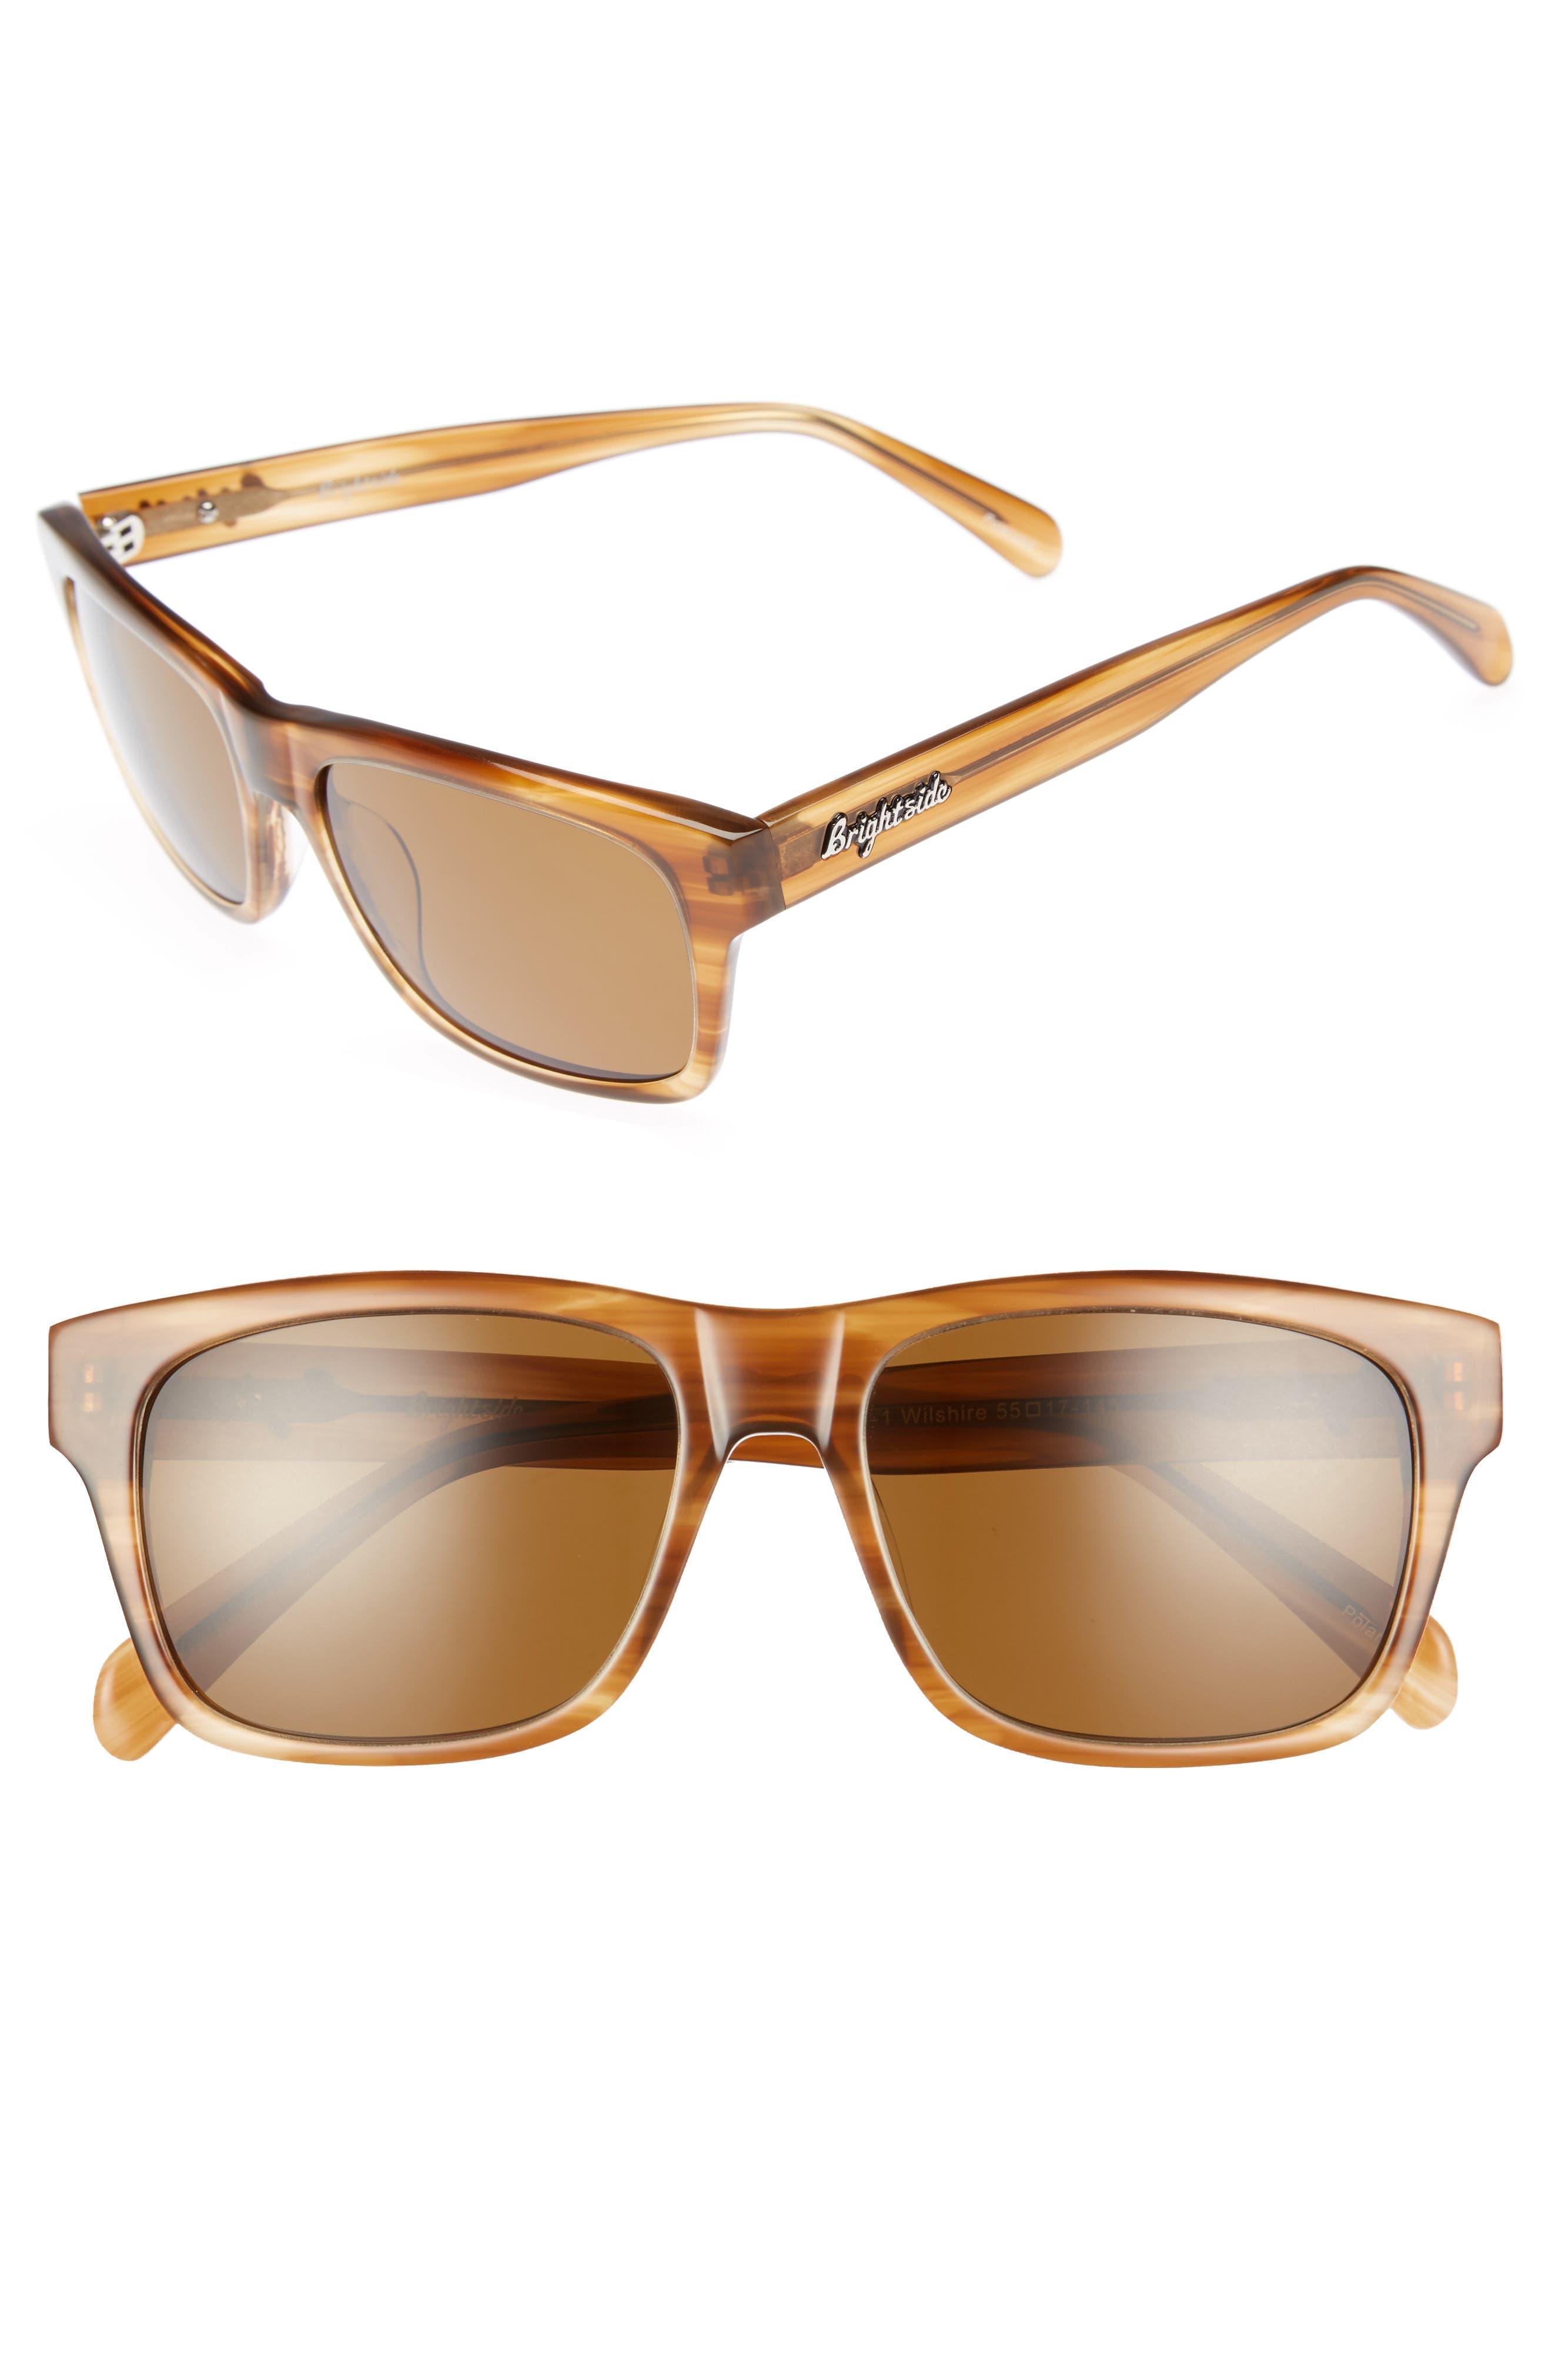 Wilshire 55mm Polarized Sunglasses